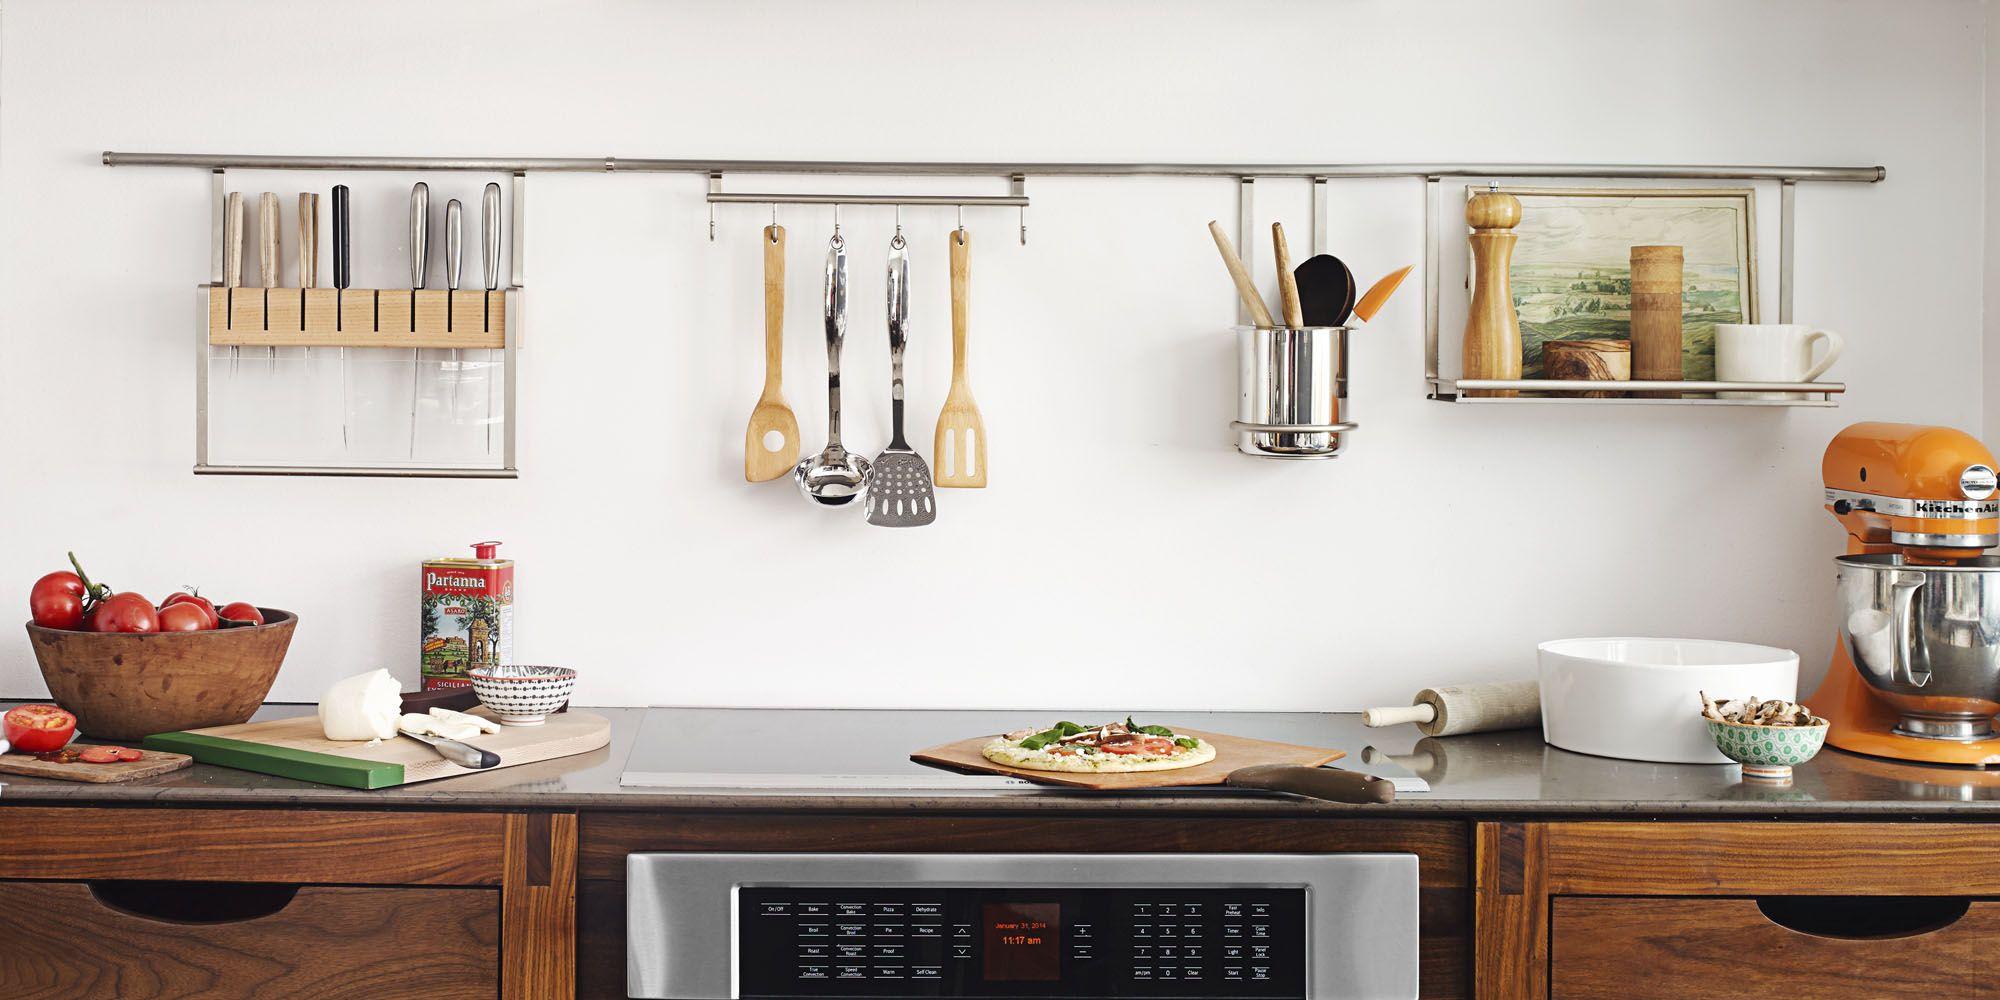 11 organization tricks that keep countertops clear - kitchen